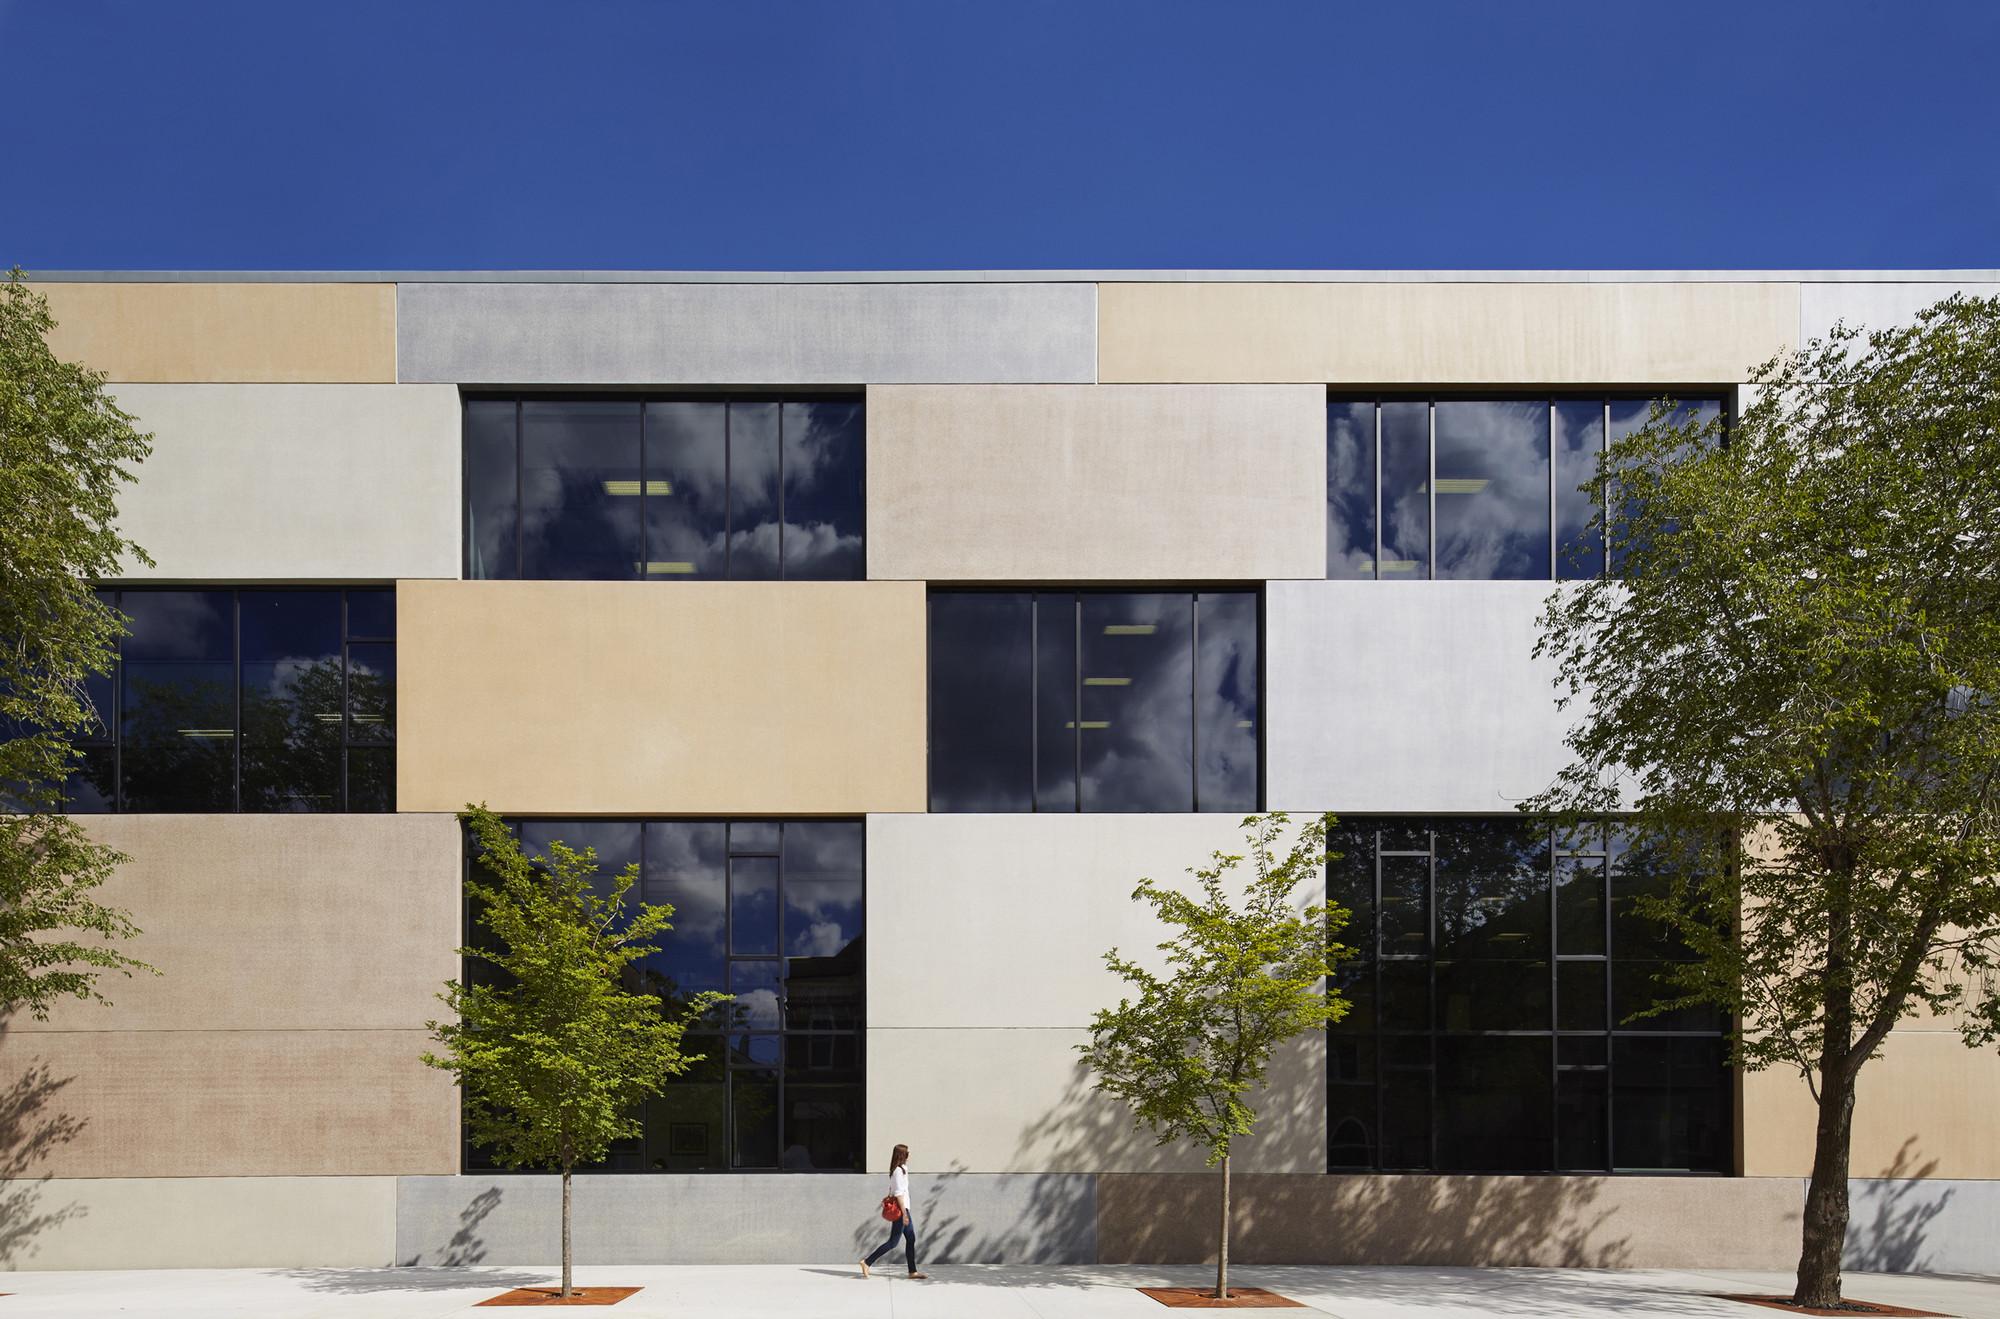 Erie Elementary Charter School / John Ronan Architects, © Steve Hall, Hedrich Blessing